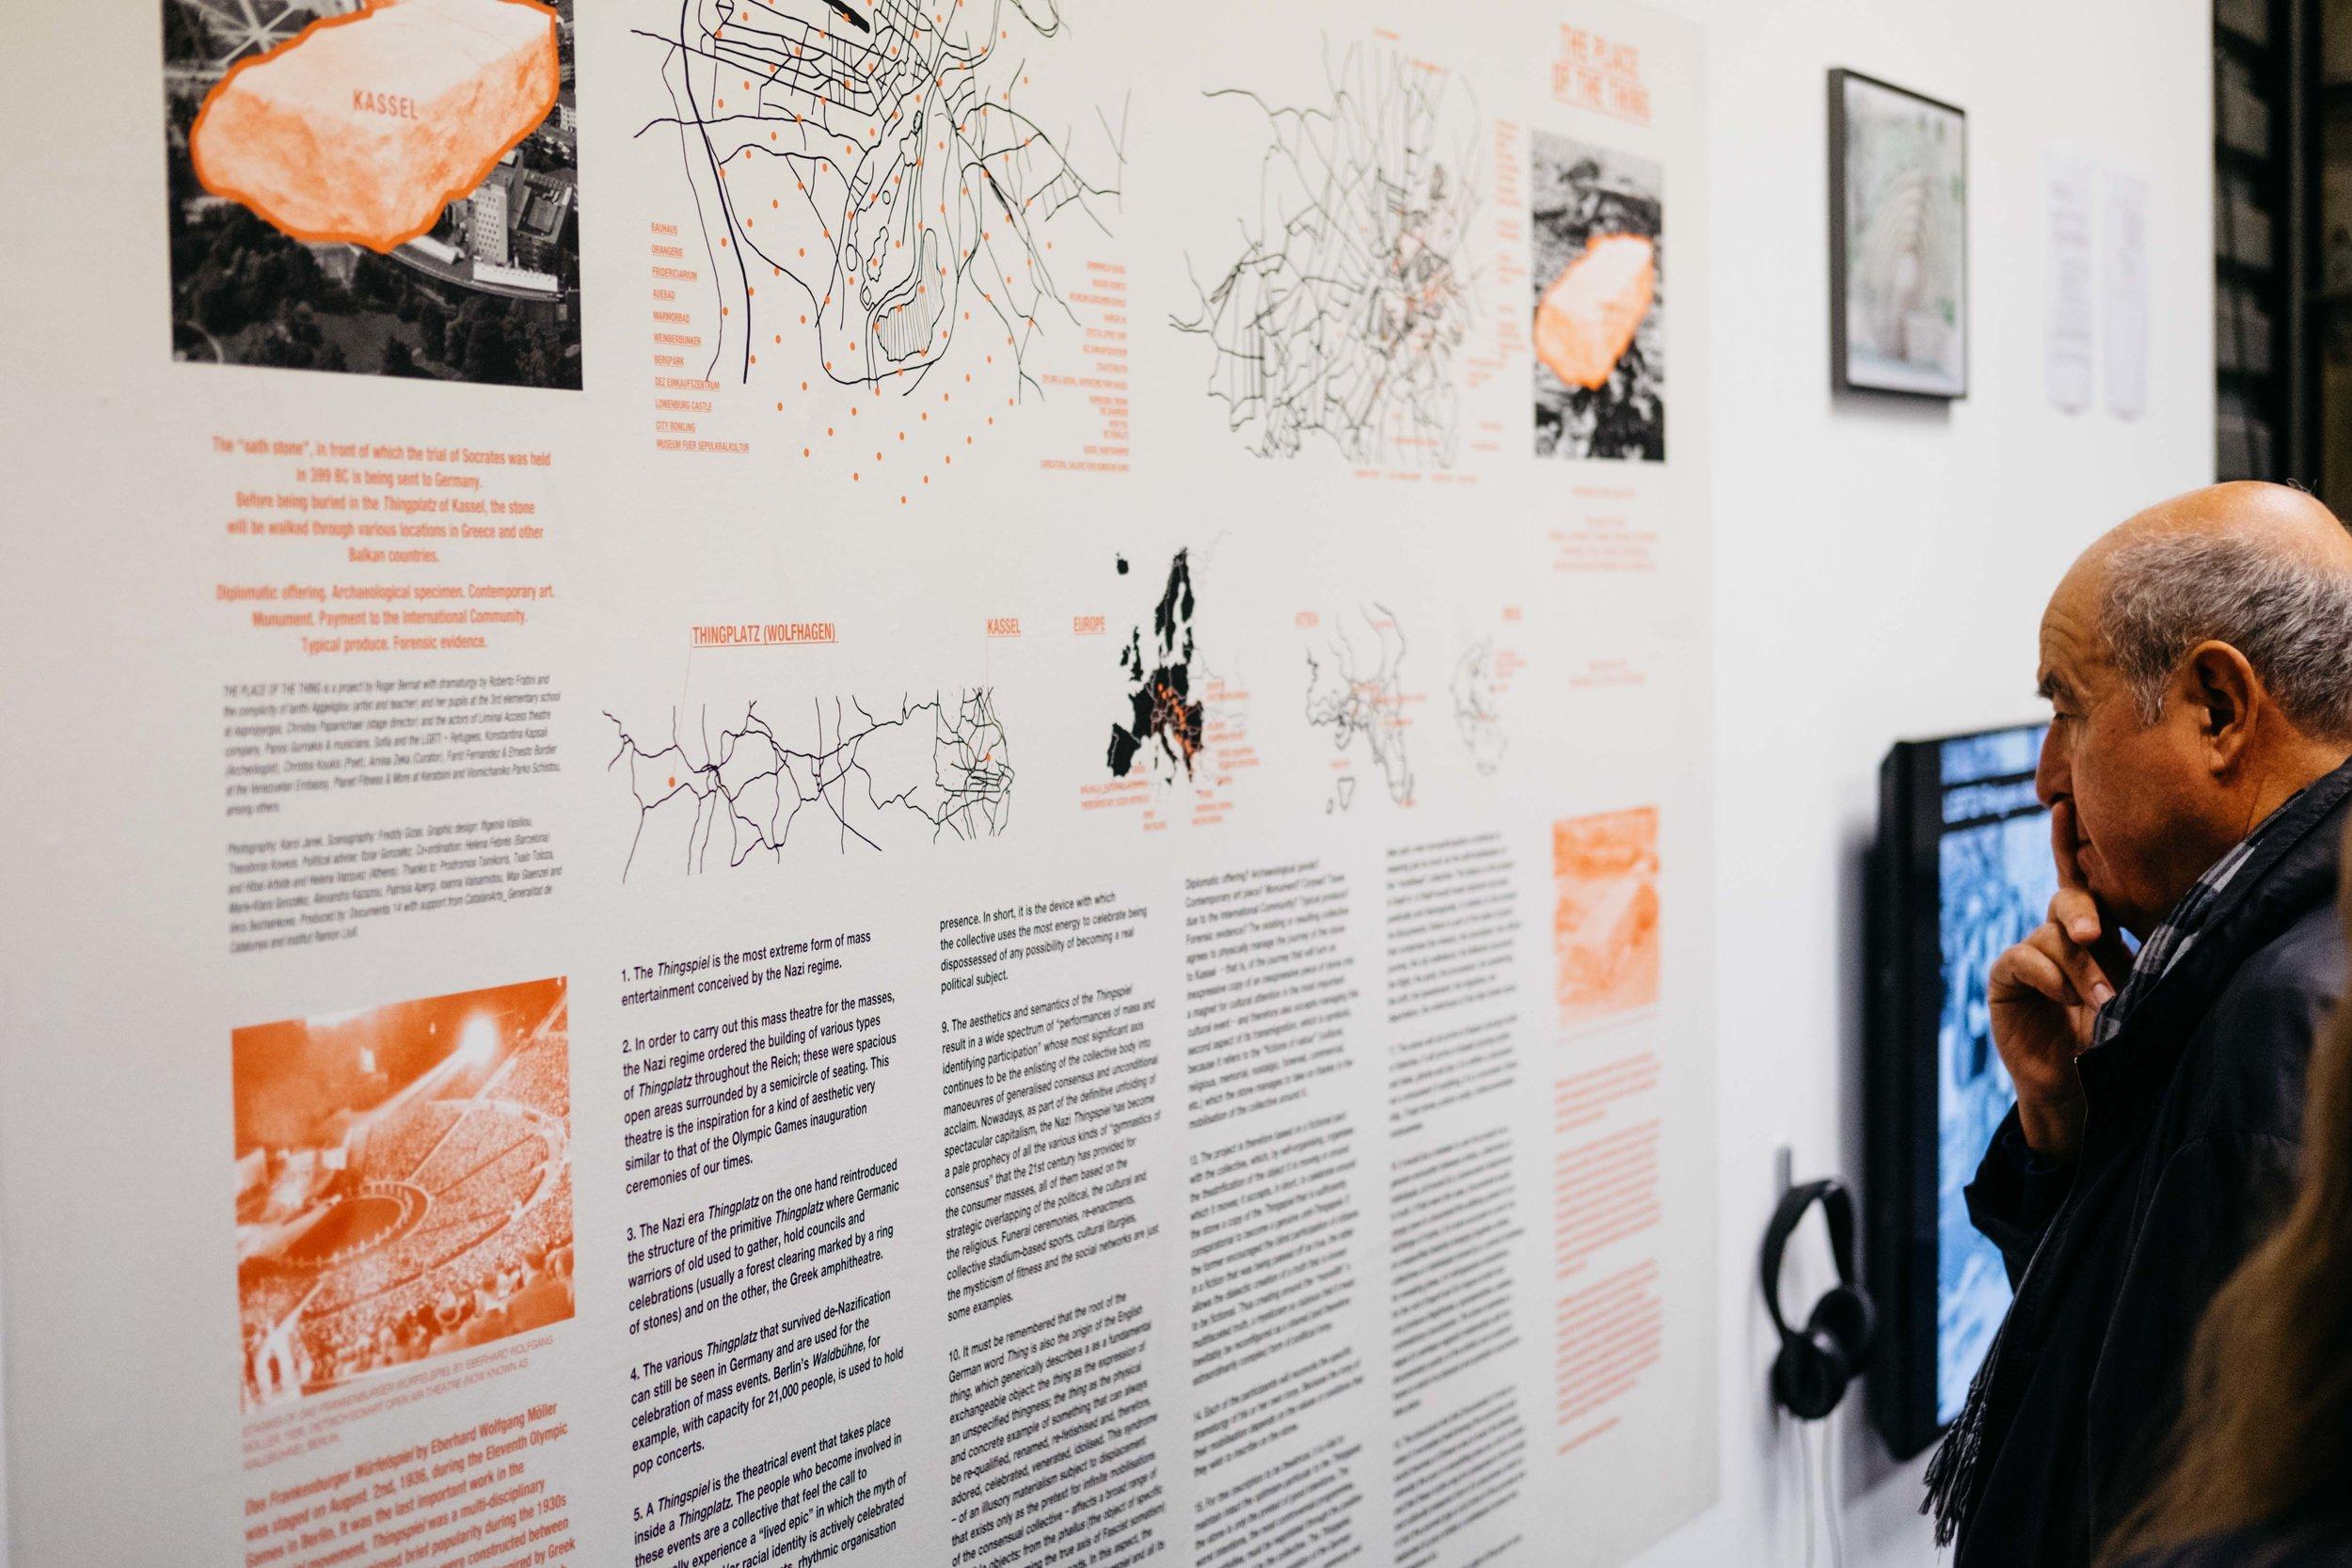 documenta14-kassel-kunst-wearecity-simonhariman-2017-18.jpg